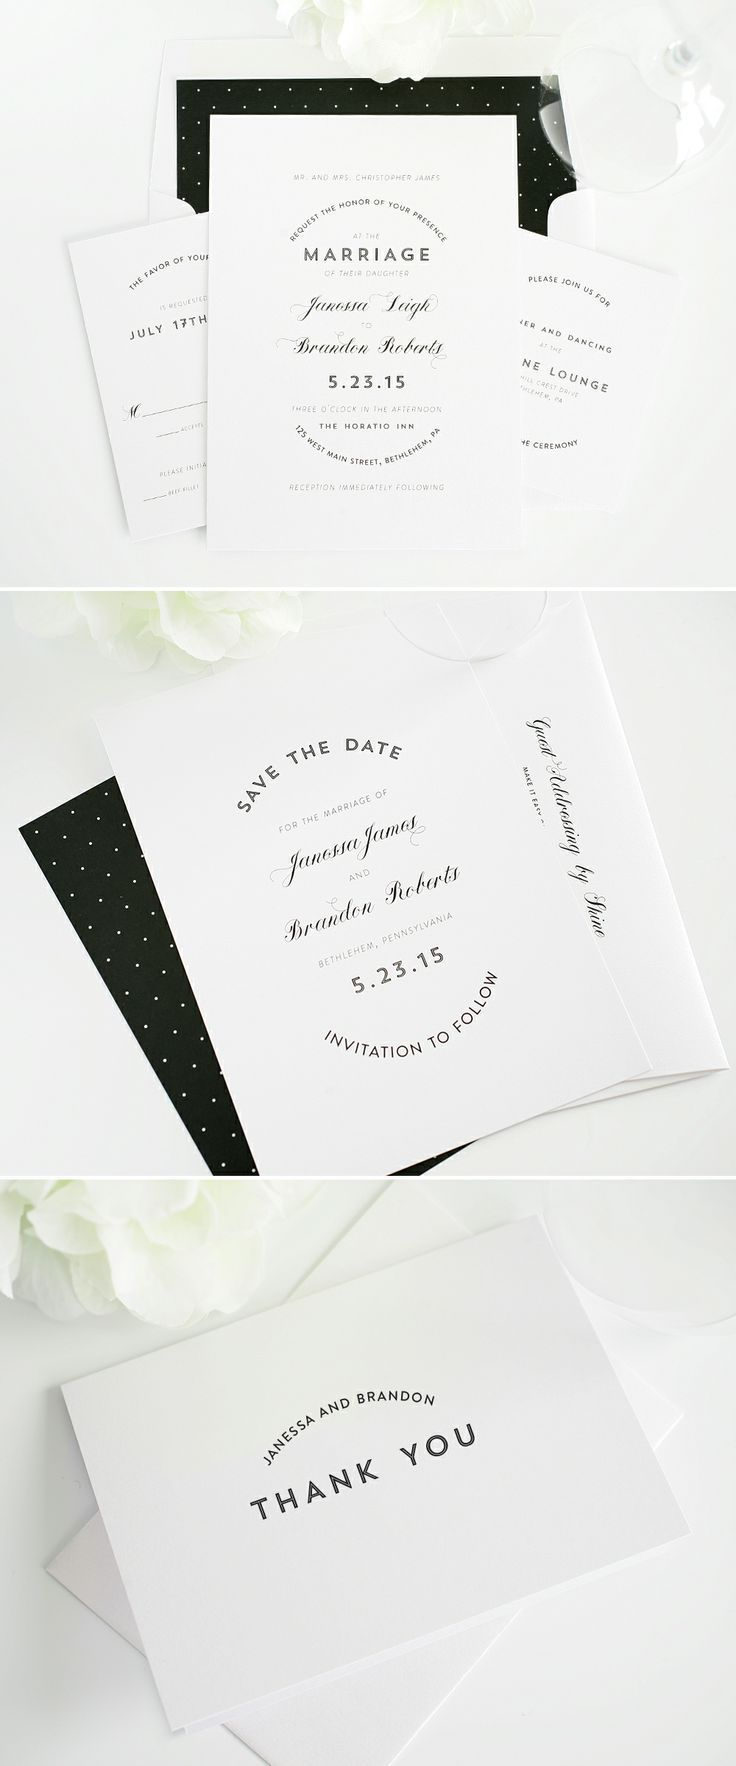 30 Gorgeous Wedding Invitation Ideas from Pinterest | StyleCaster